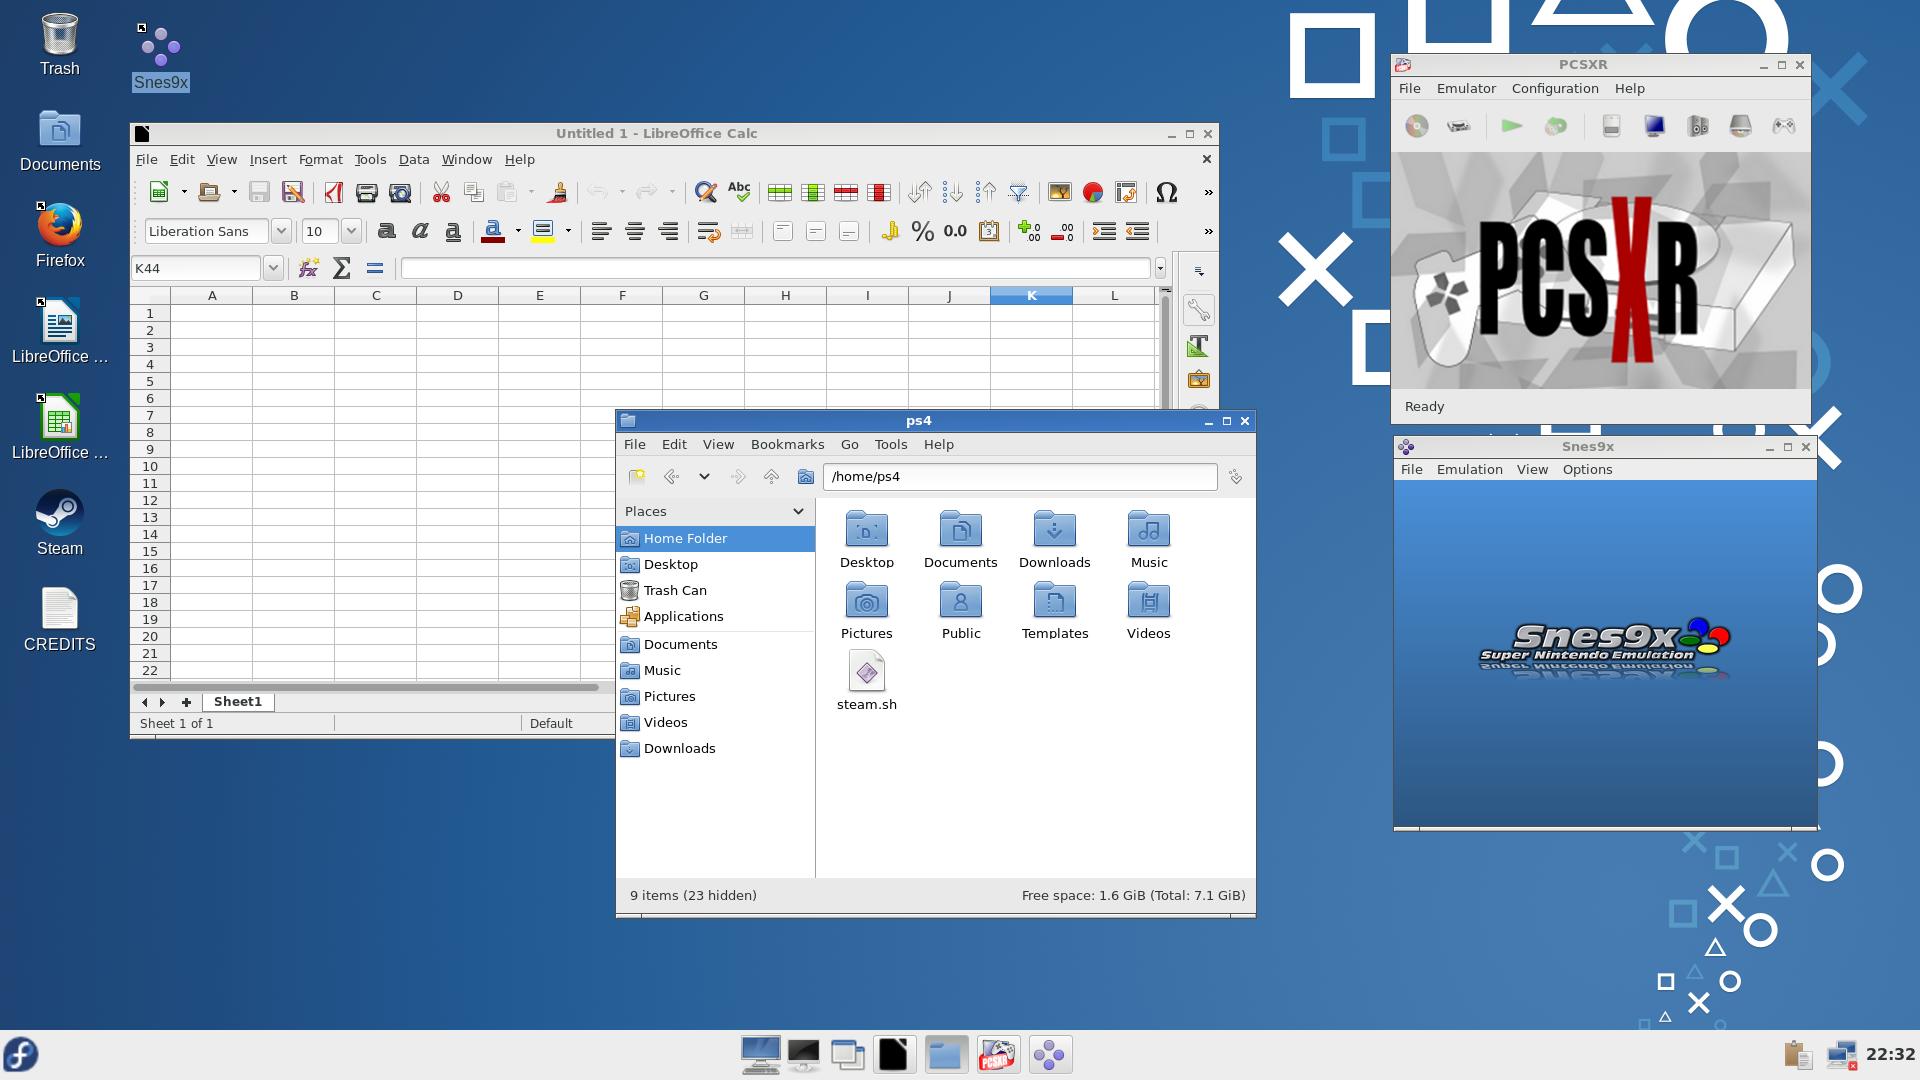 Дистрибутив Linux для PS4 со Steam-ом, офисом и эмуляторами